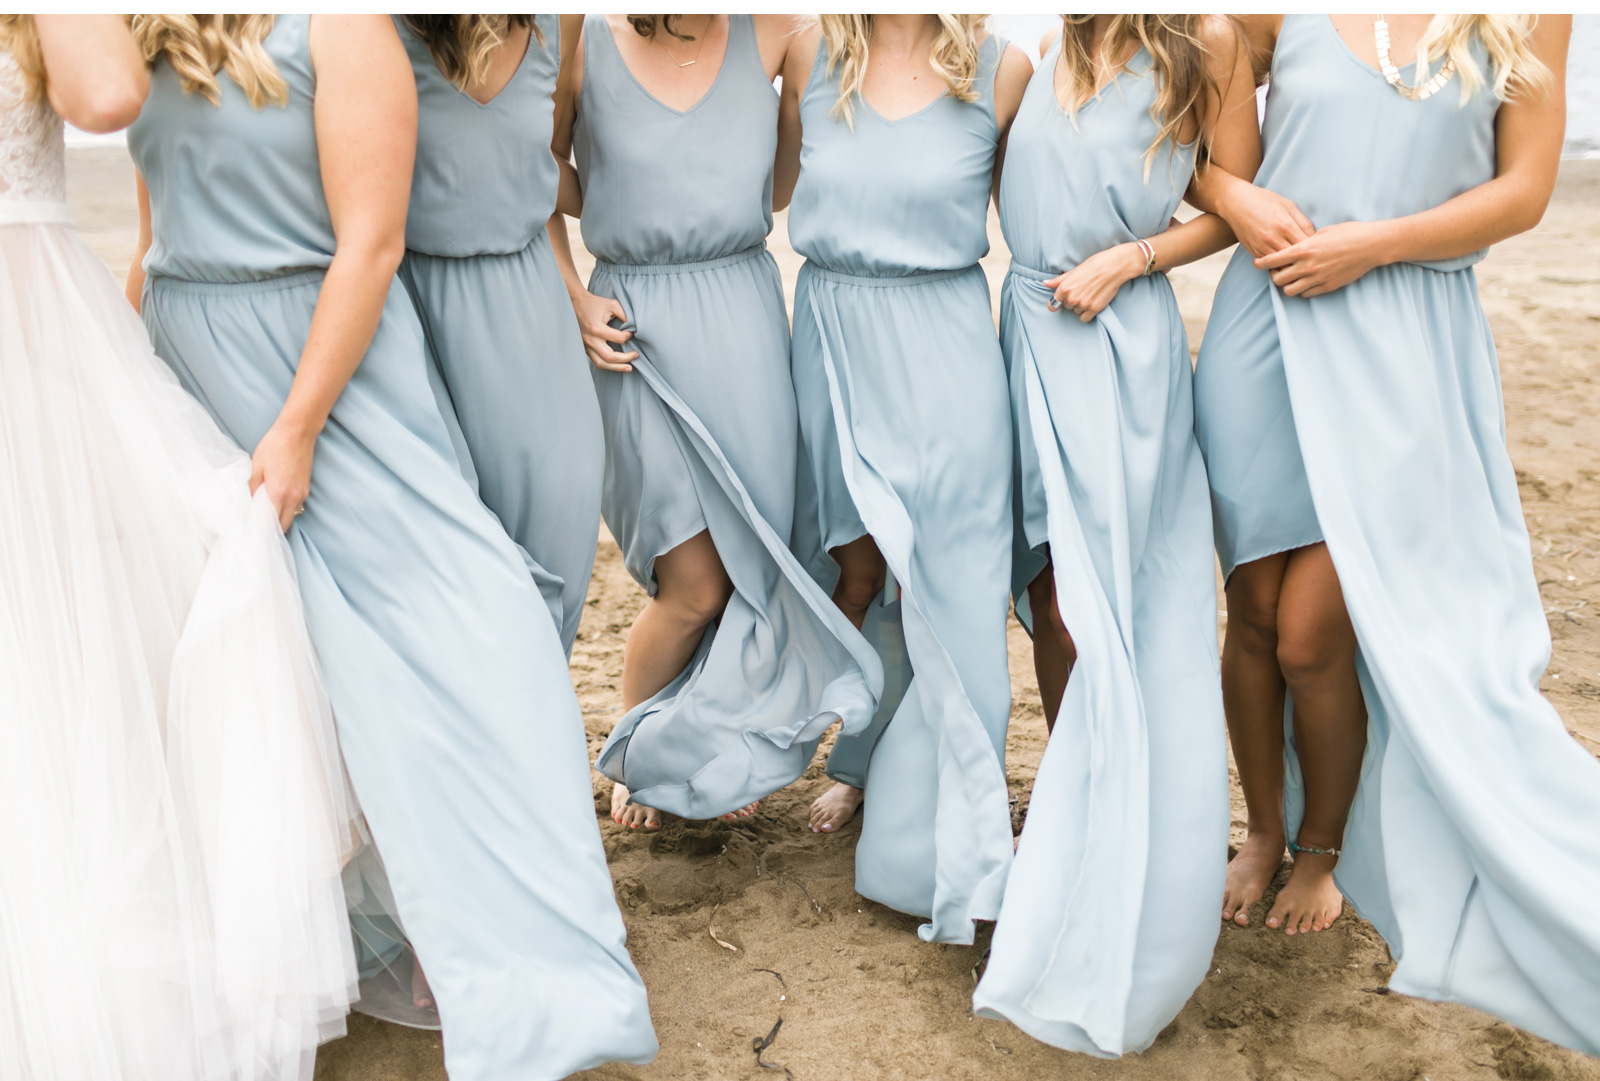 San-Luis-Obispo-Wedding-Show-Me-Your-Mumu-Natalie-Schutt-Photography_05.jpg